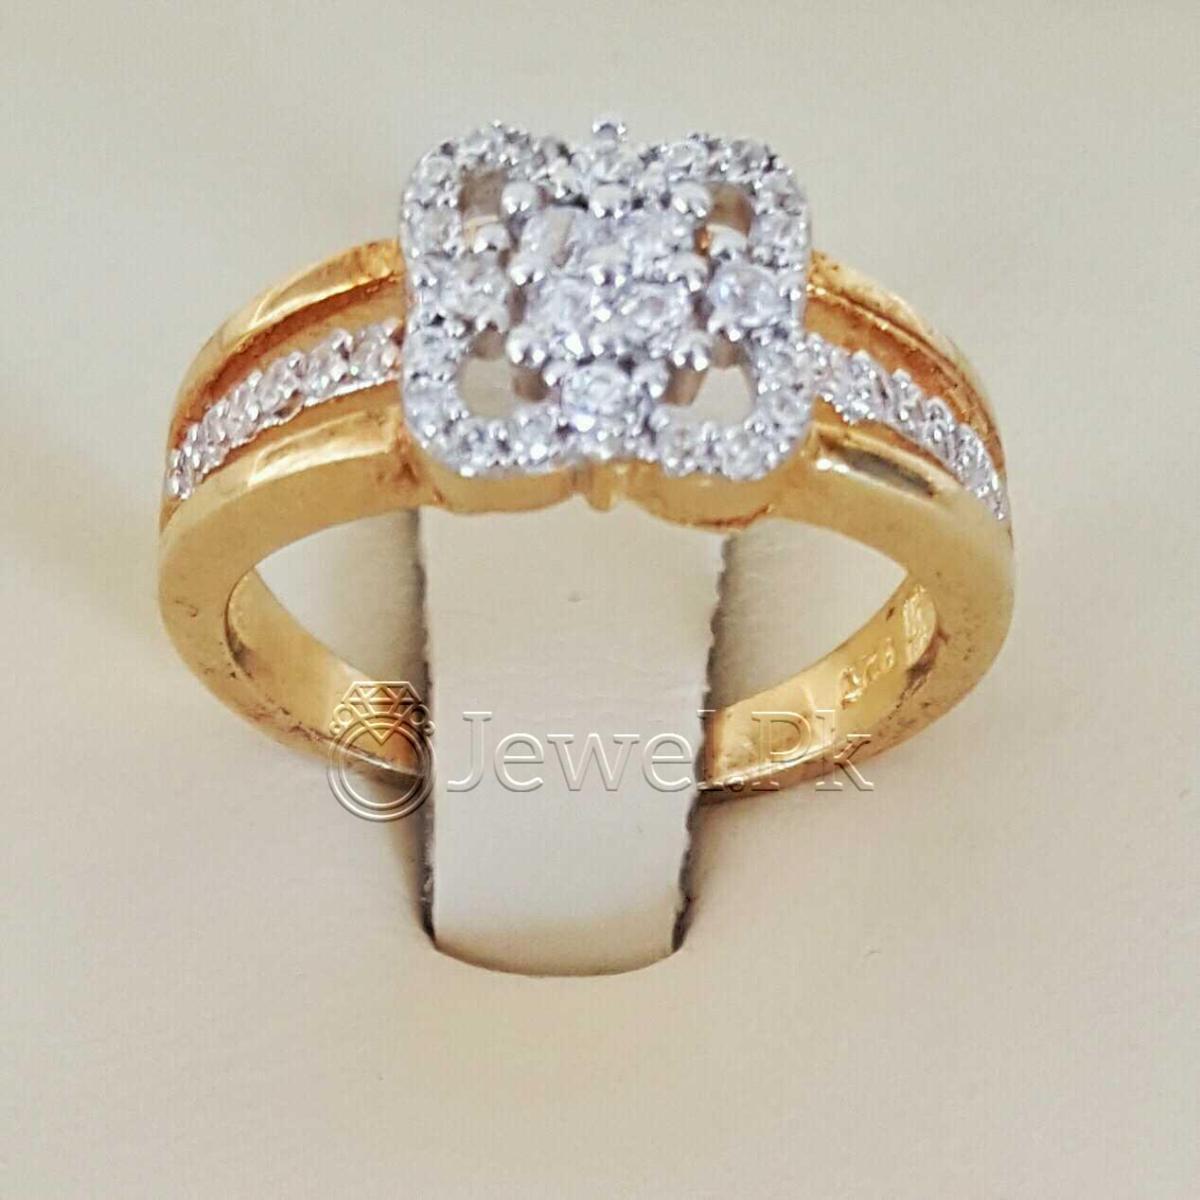 925 Silver Luxury Rings for Ladies Women Silver Rings Woman Handmade Rings 24 natural gemstones pakistan + 925 silver jewelry online